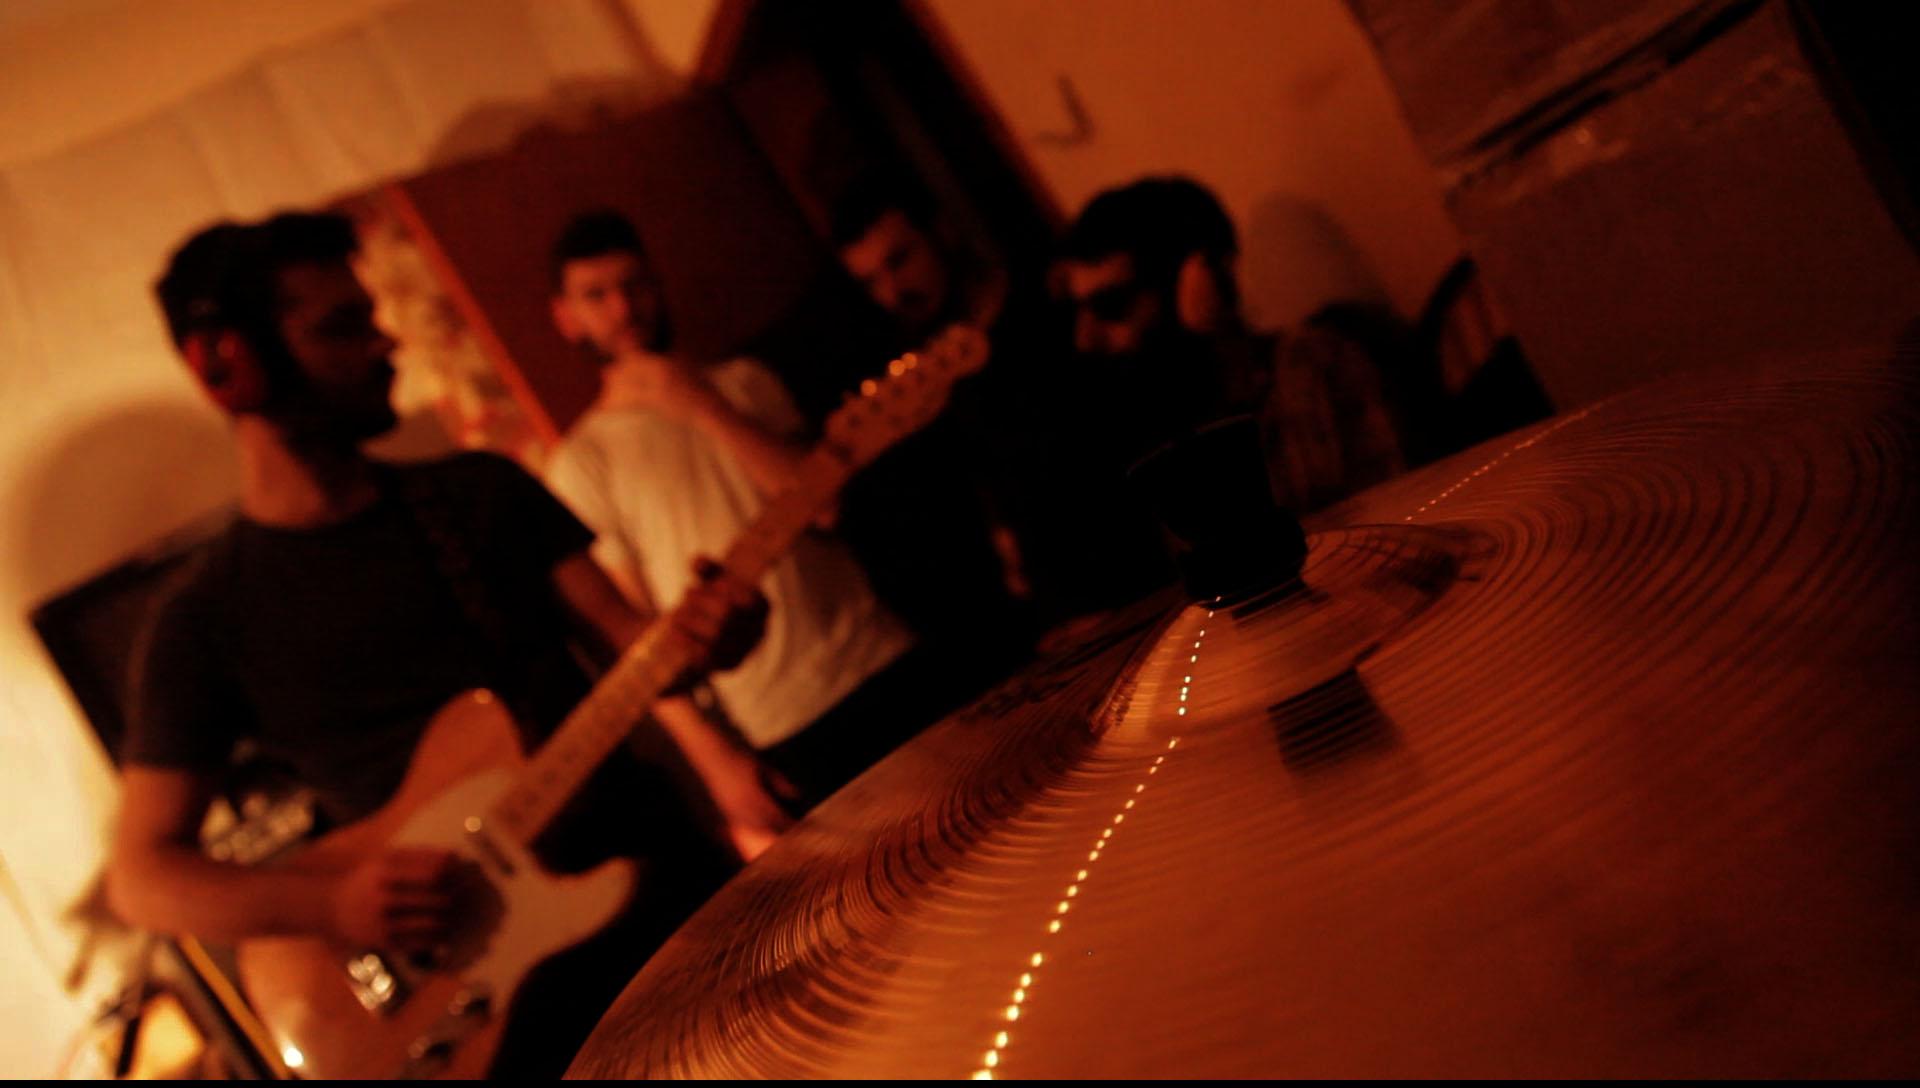 naxatras recording